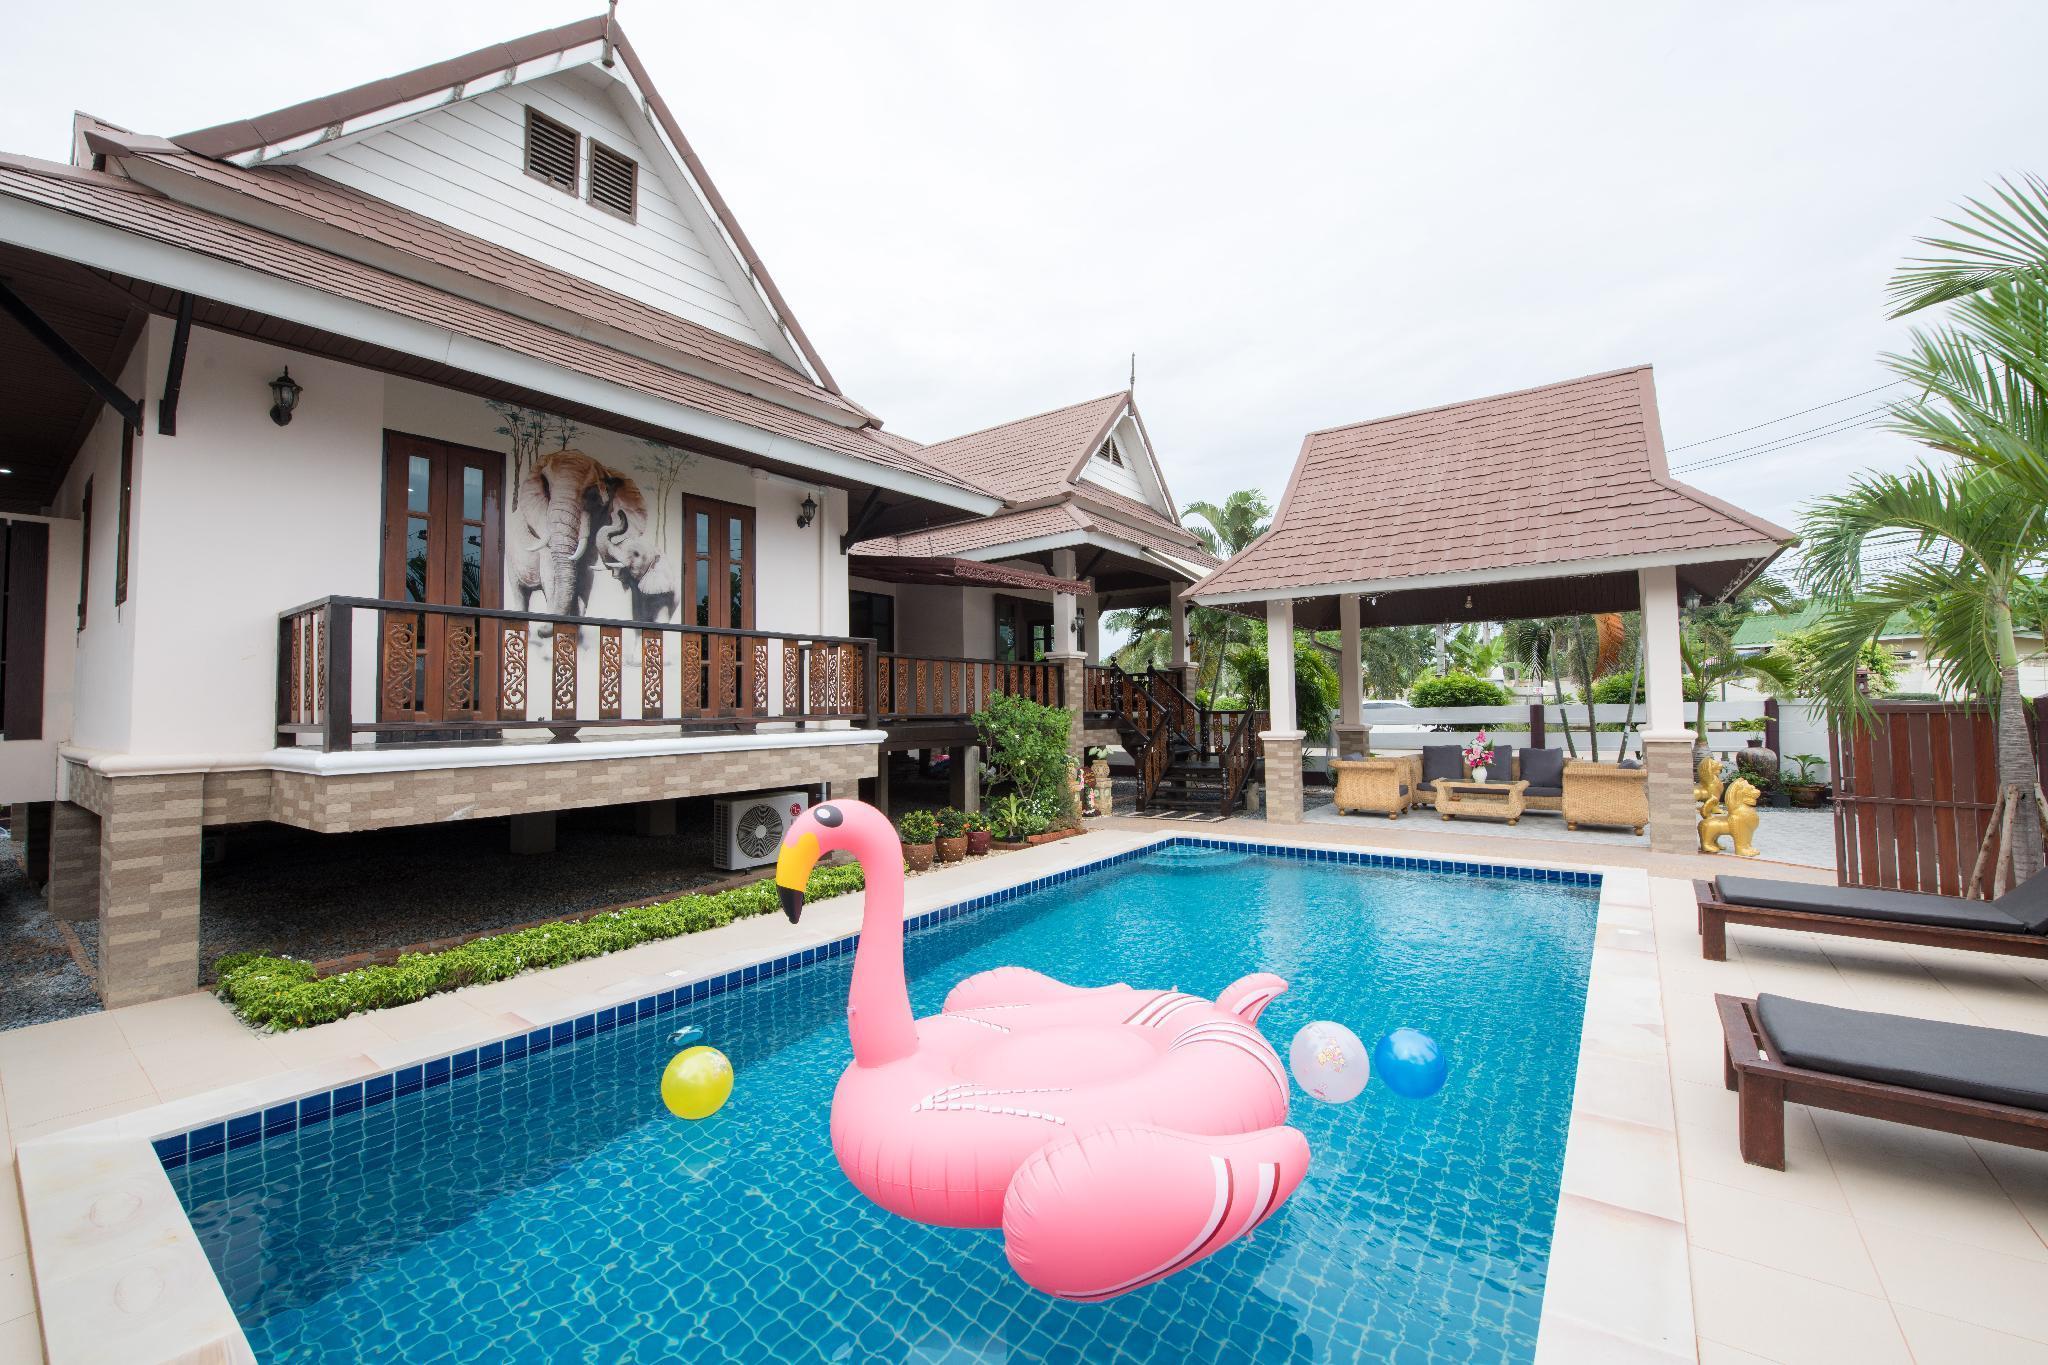 Jasmine Villa and pool pattaya บ้านเดี่ยว 3 ห้องนอน 3 ห้องน้ำส่วนตัว ขนาด 420 ตร.ม. – เขาตาโล